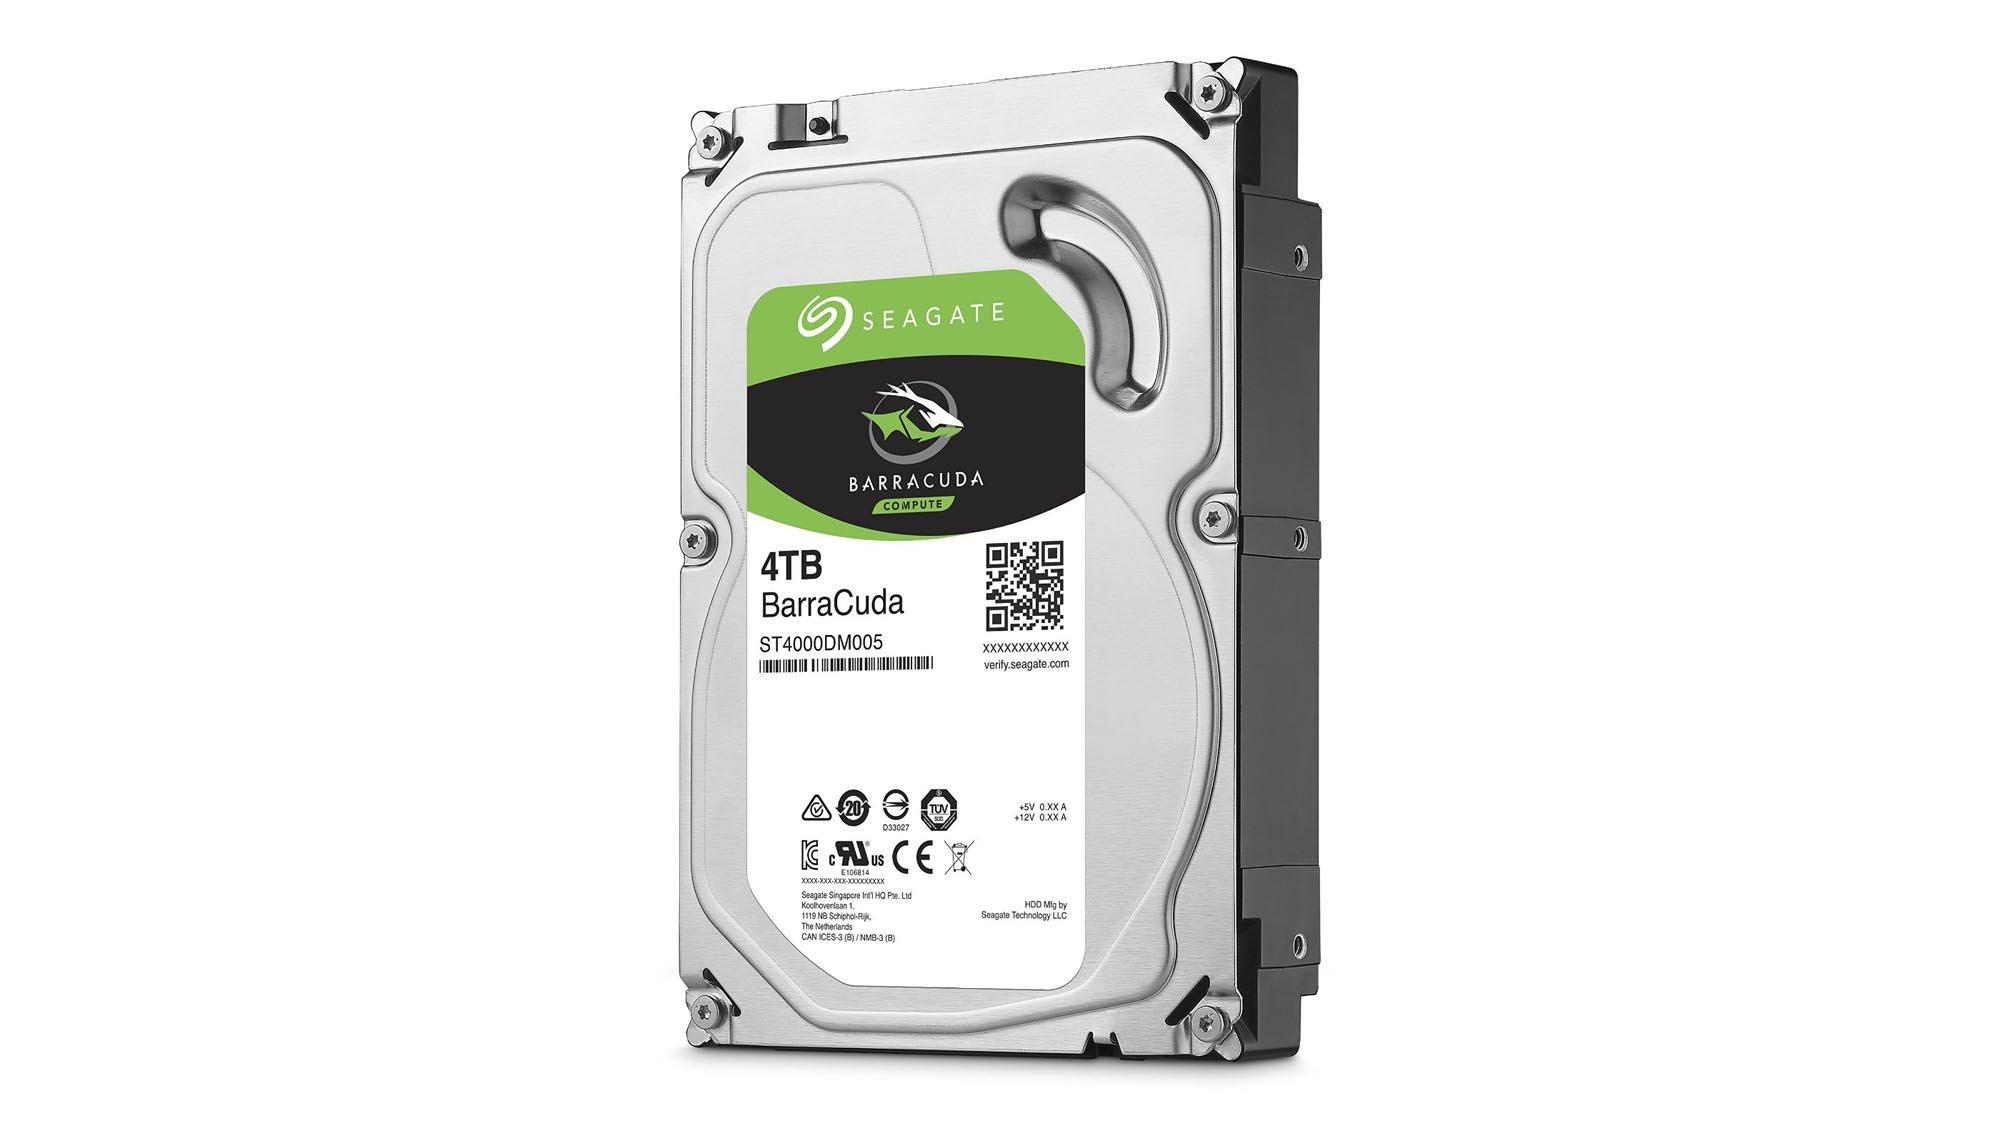 Best internal hard drives 2018: The best high-capacity HDDs